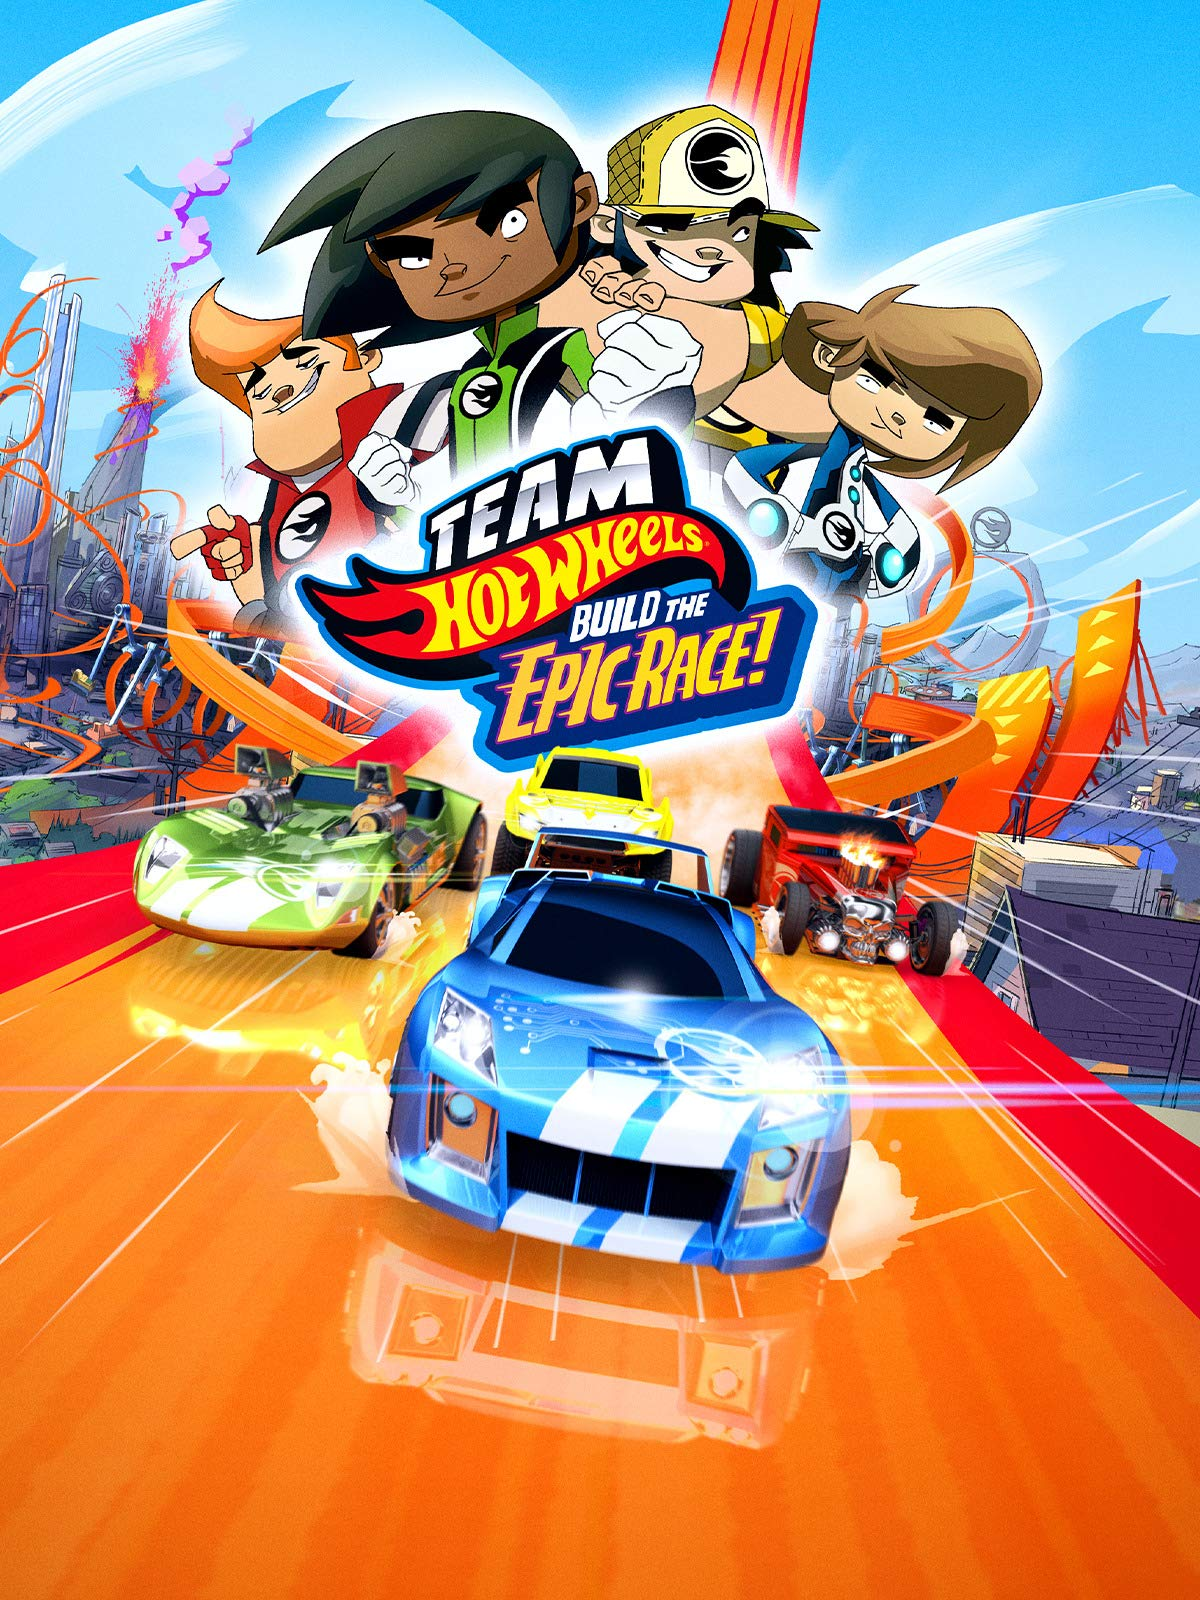 Team Hot Wheels, Build the Epic Race